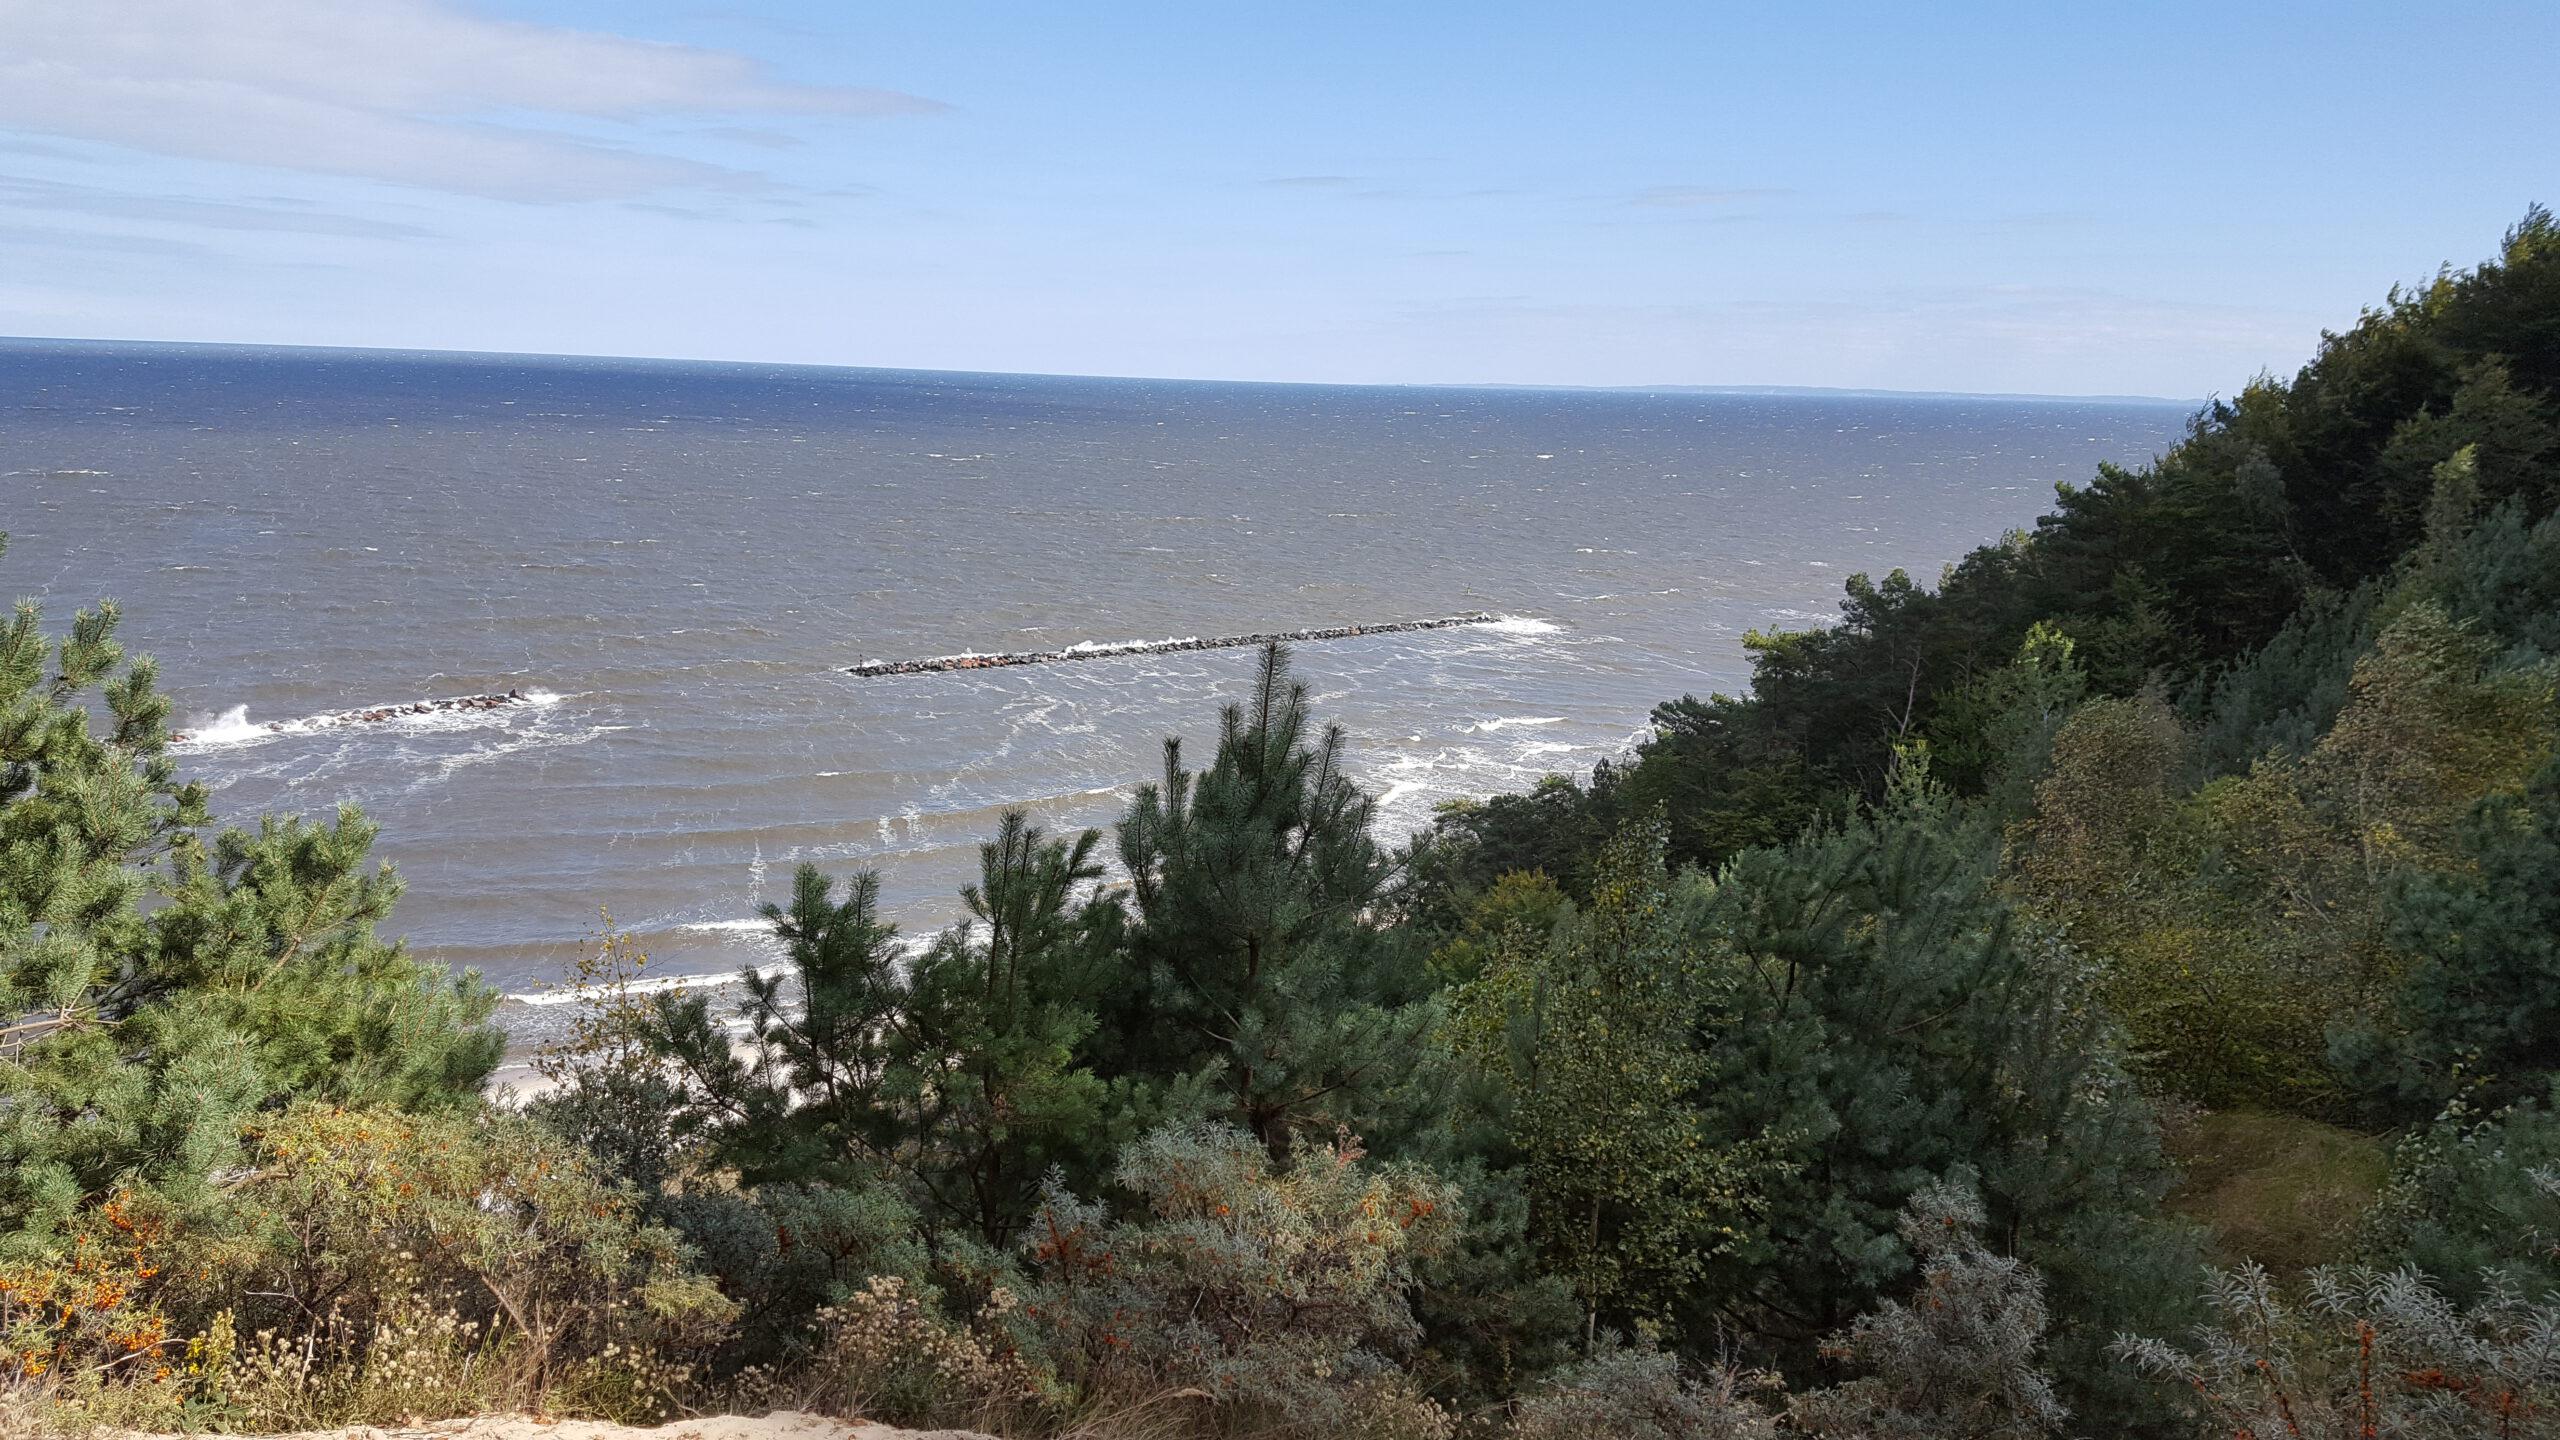 Blick vom Streckelsberg Koserow - Ostsee Urlaub Wanderwege Zempin Insel Usdeom Ausflusgziel